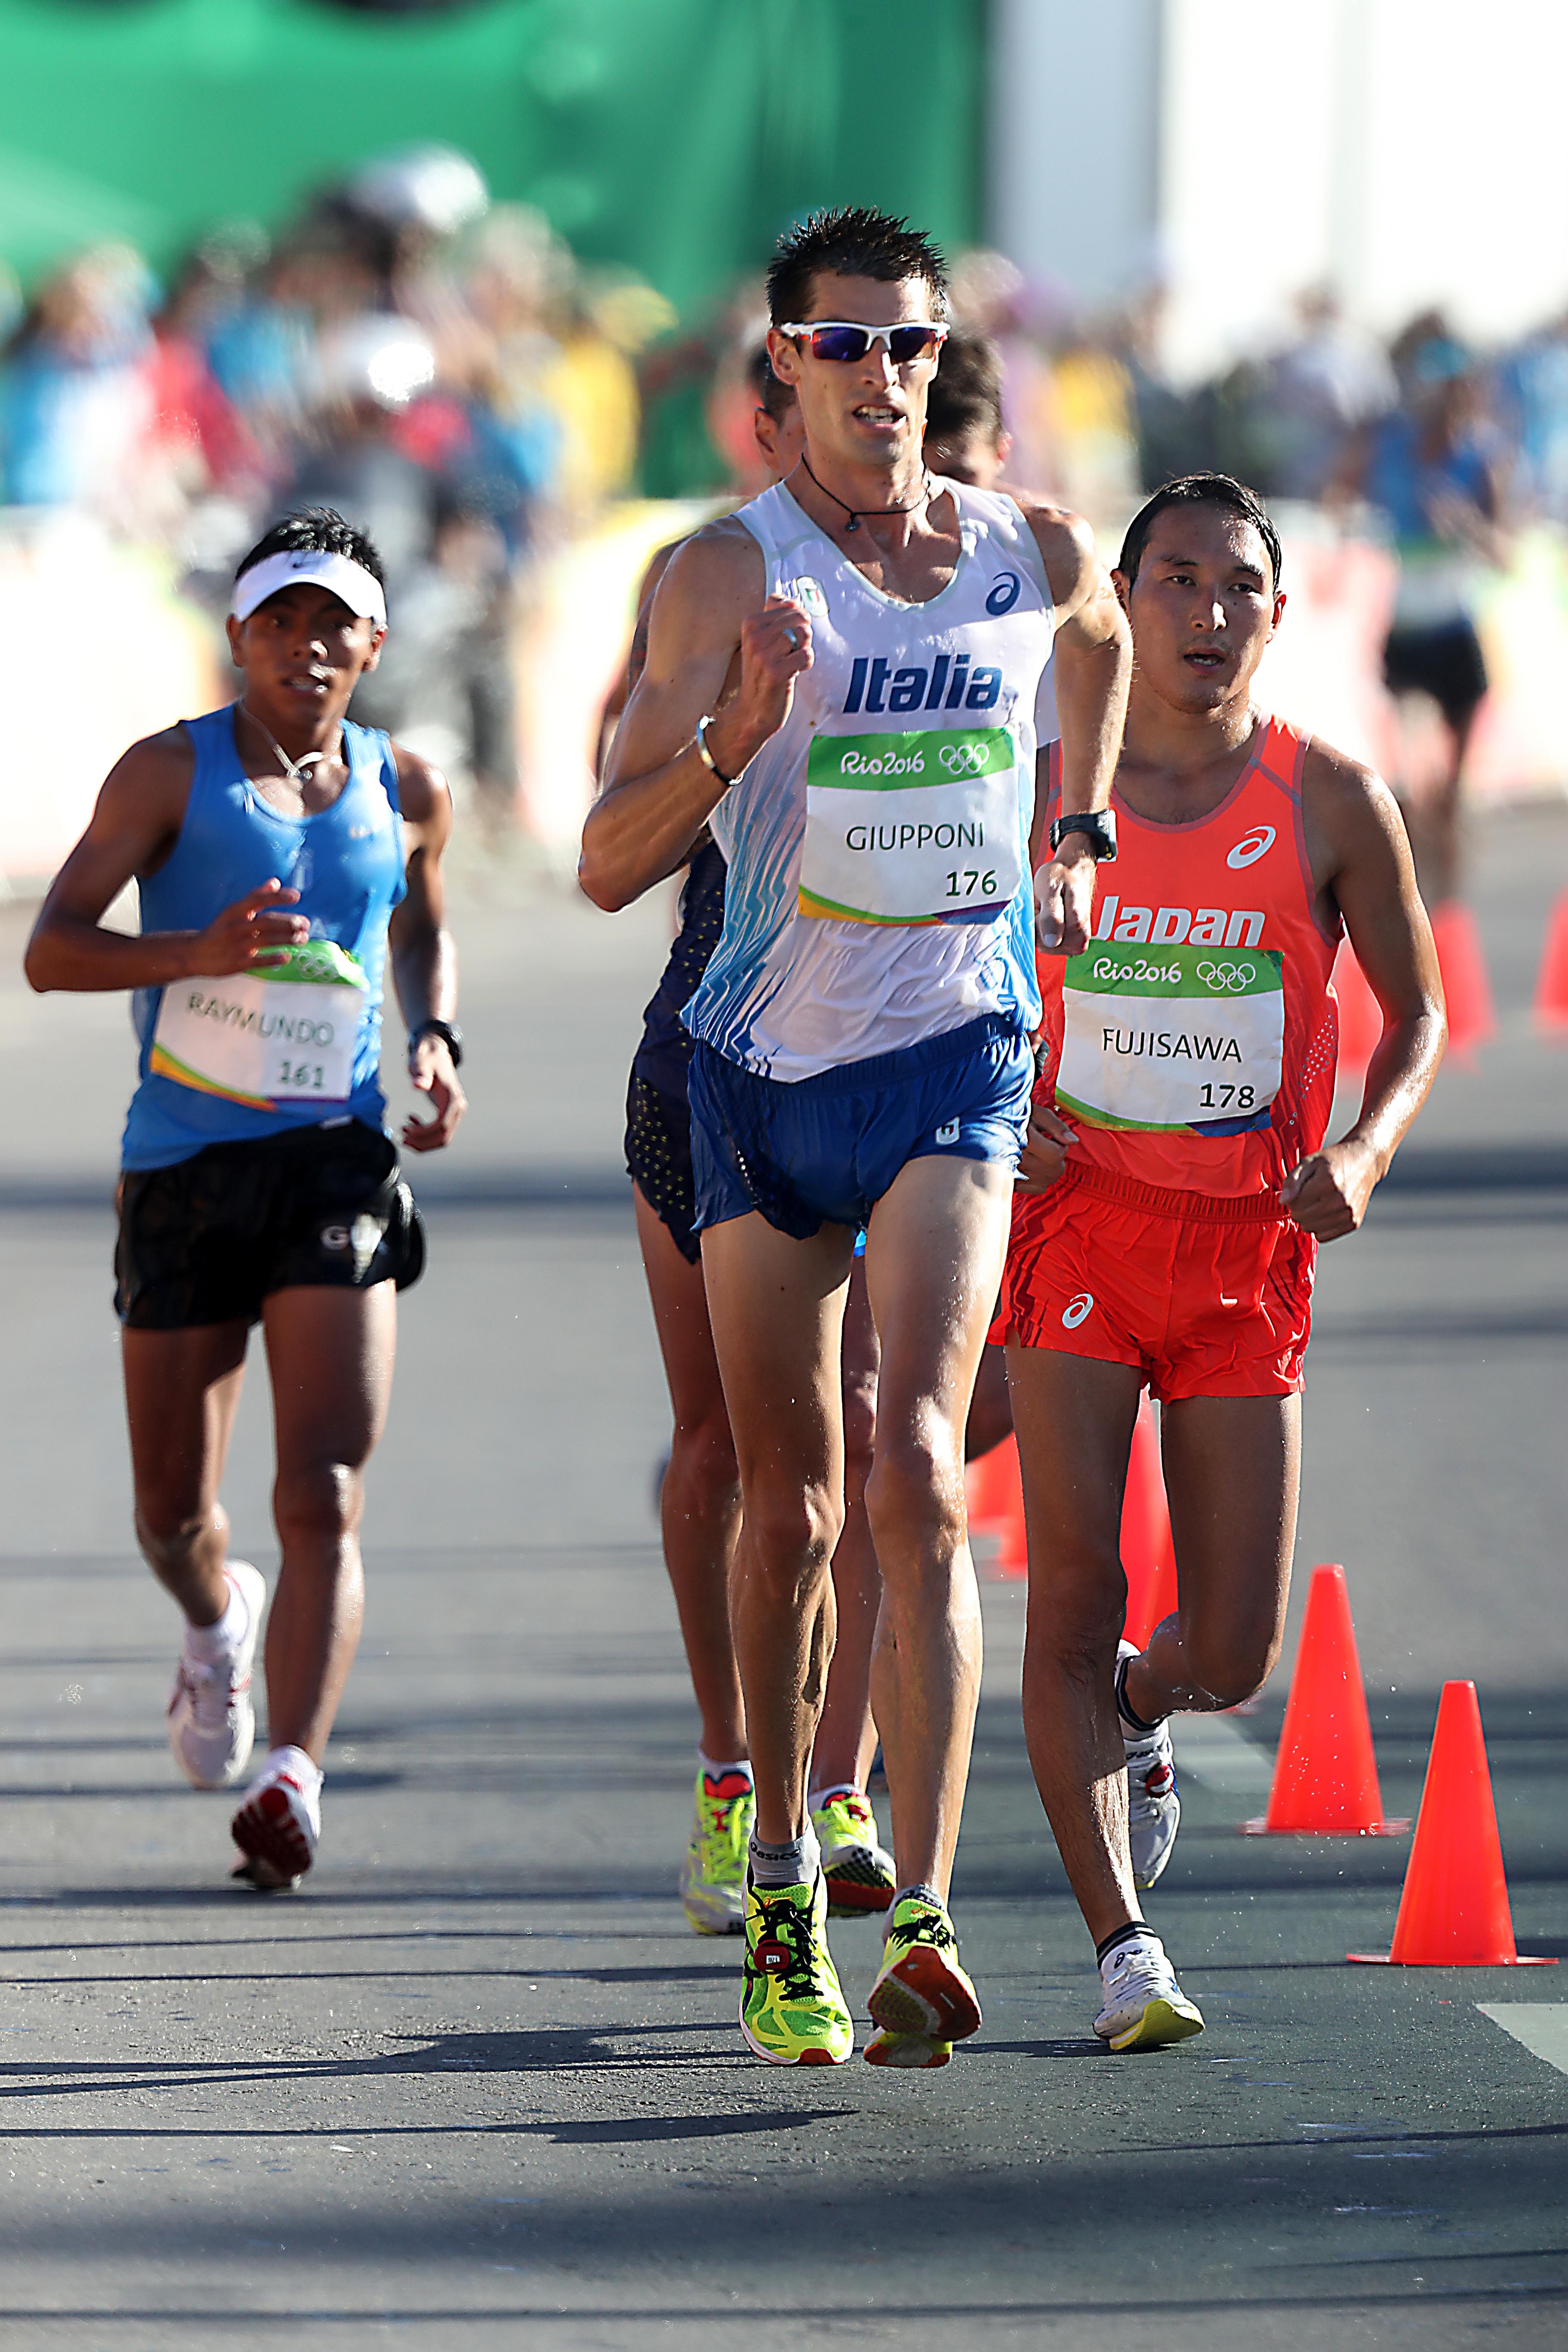 b22b1583f13d1 Rio de Janeiro 12 08 2016 Olimpiadi Estive Rio2016